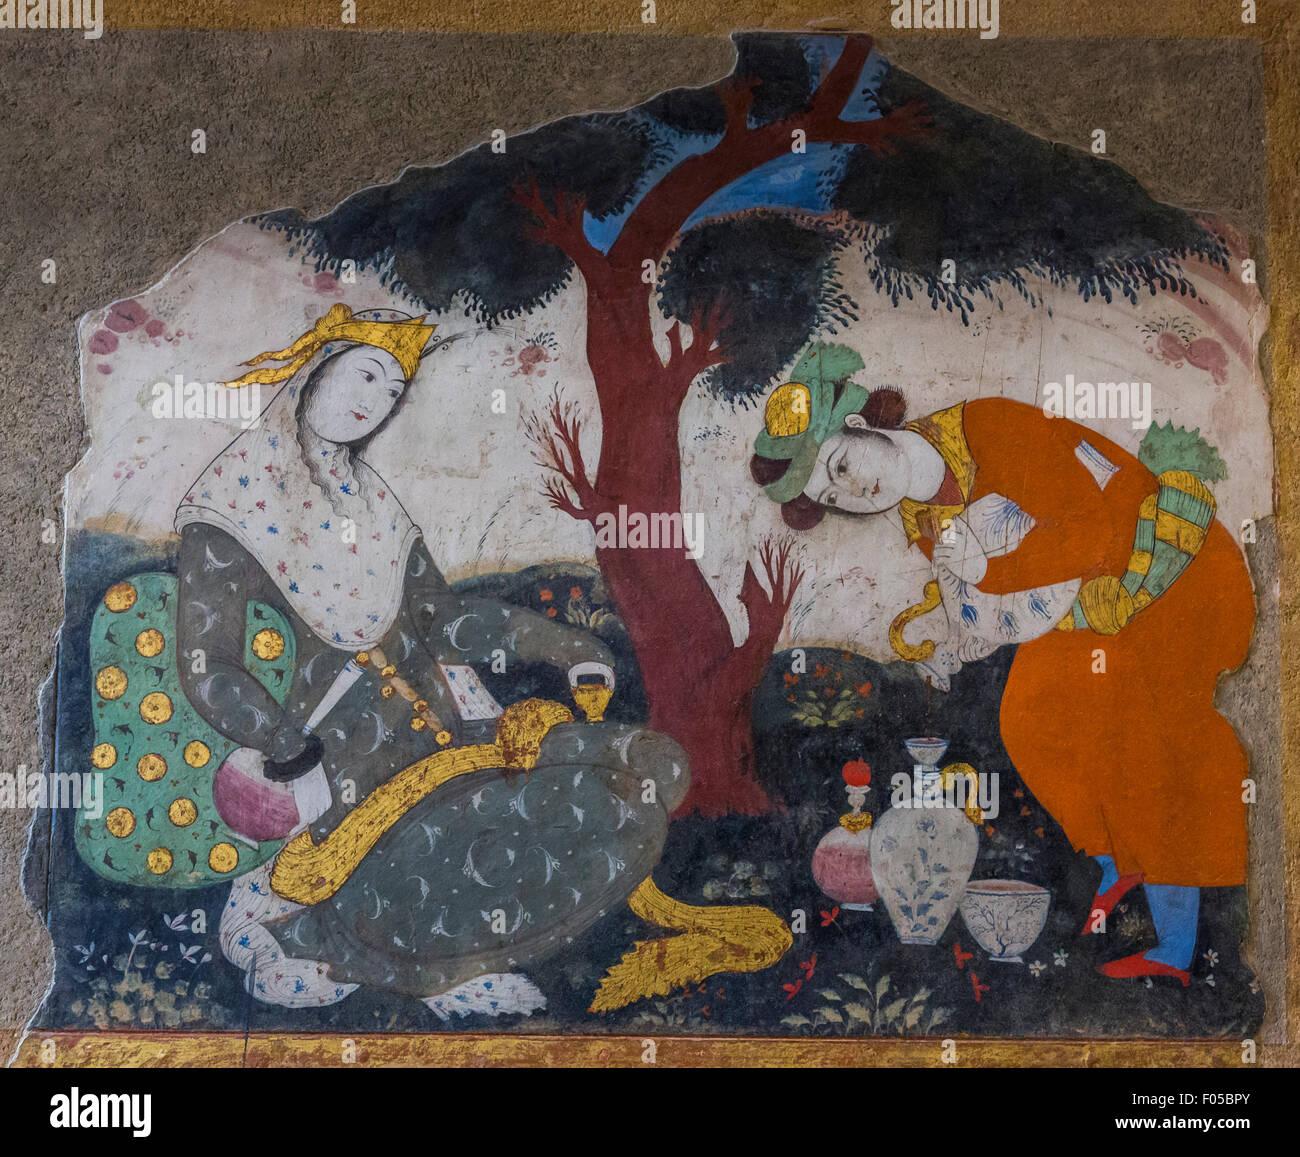 painting in main hall, Chehel Sutun Palace, Isfahan, Iran Stock Photo